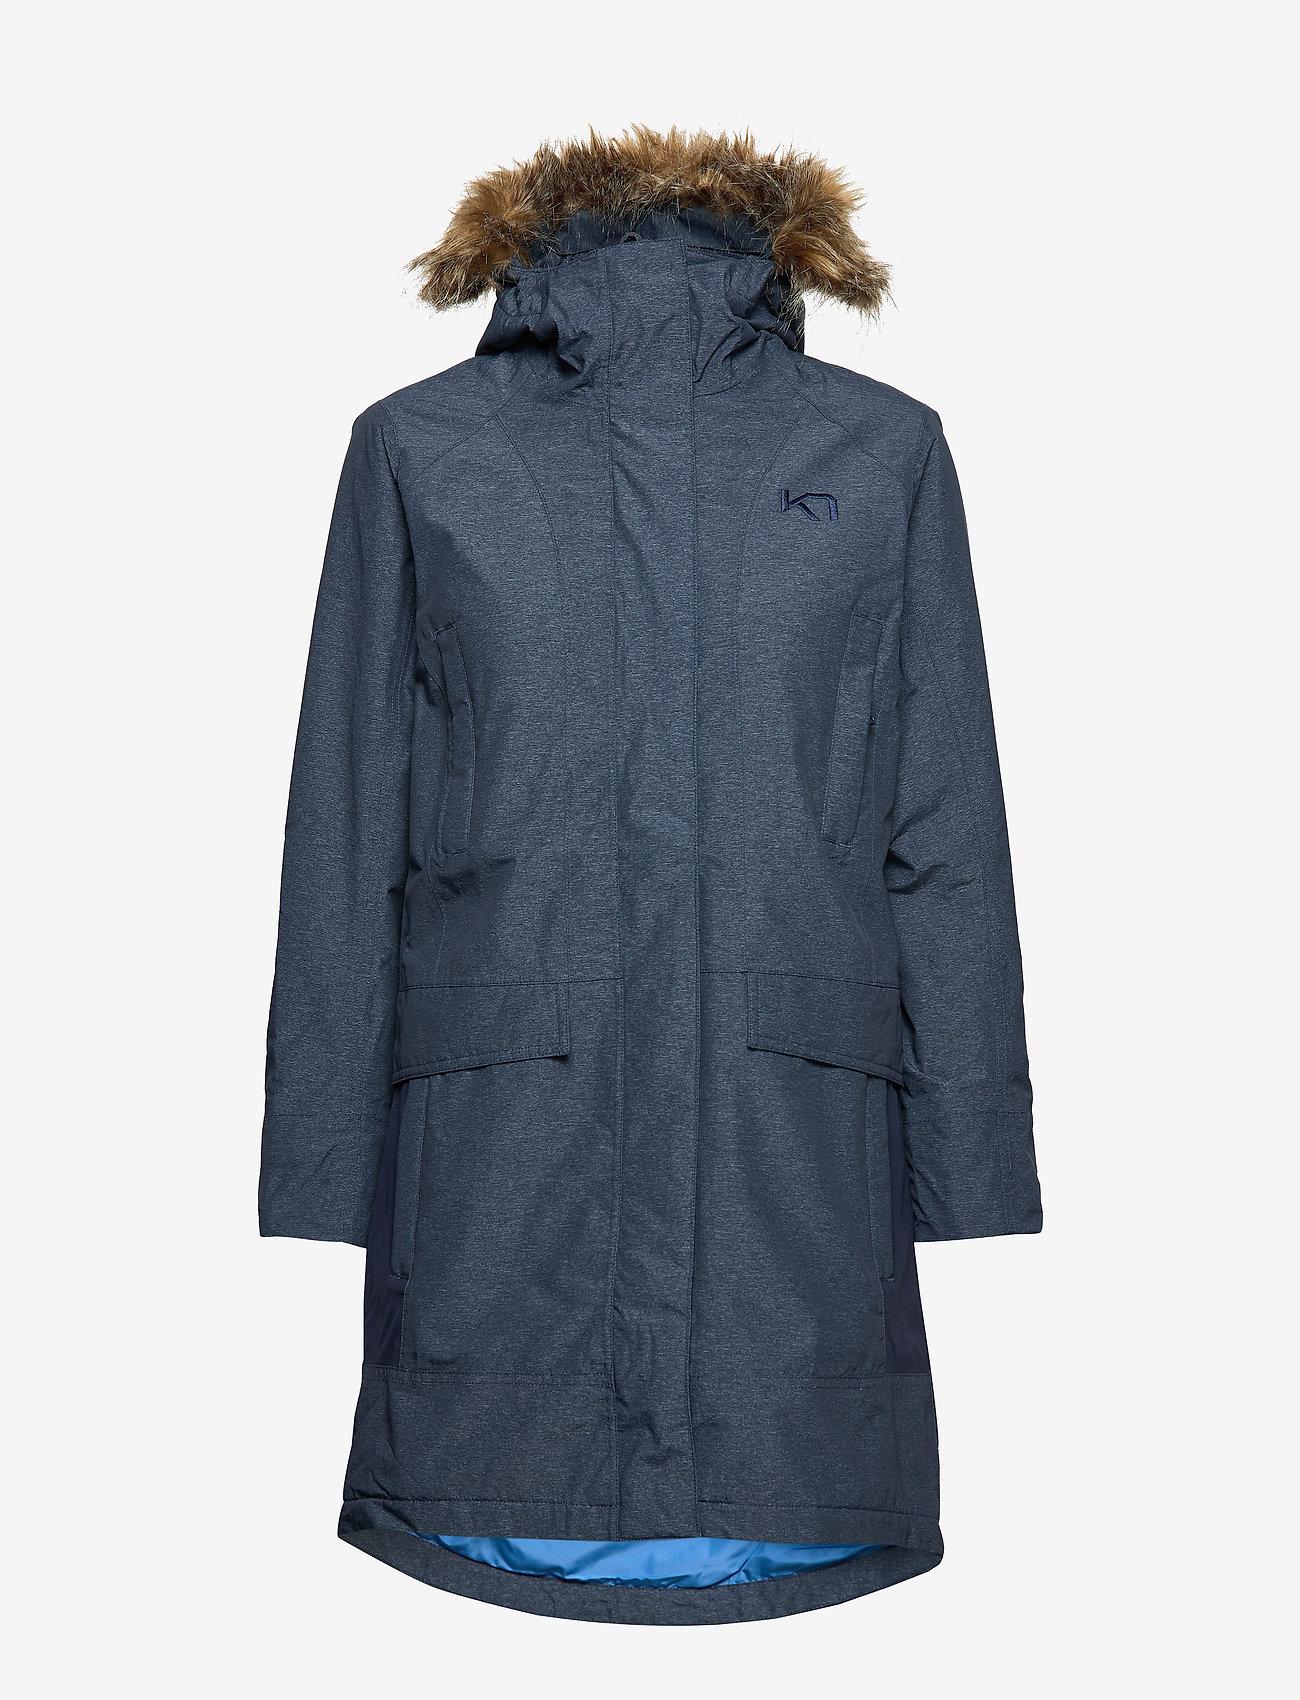 Kari Traa - HELLAND PARKA - parka coats - naval - 1